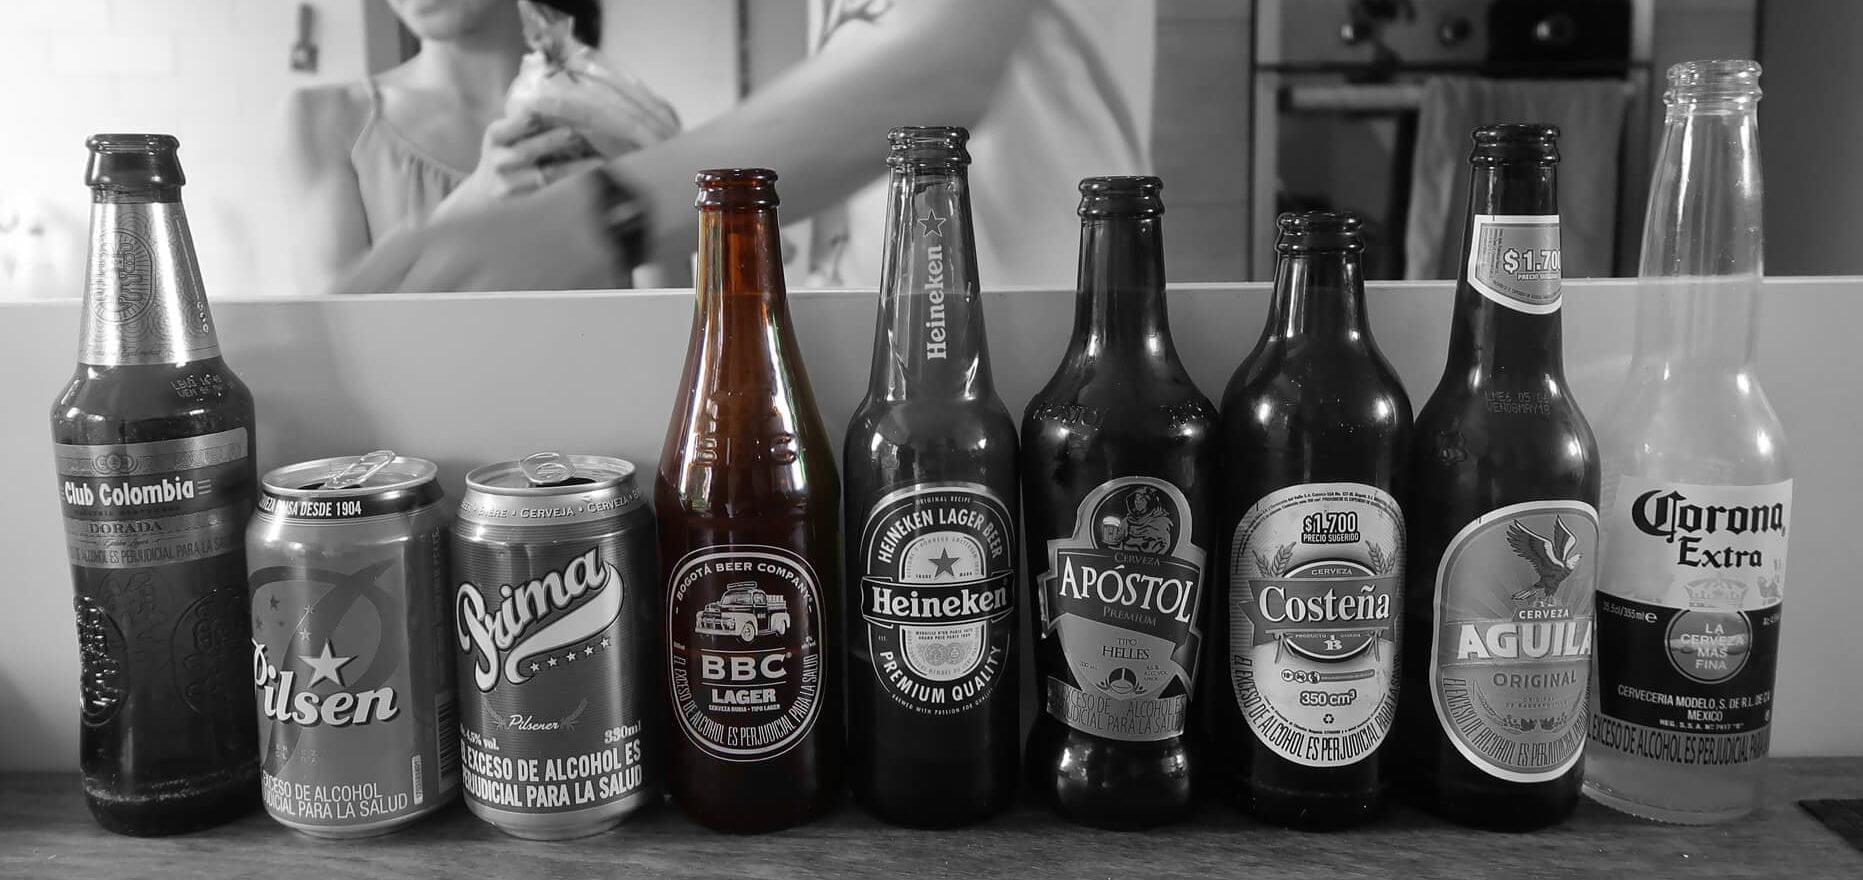 Bogota Beer Company Colombian Beer Blind Taste Test